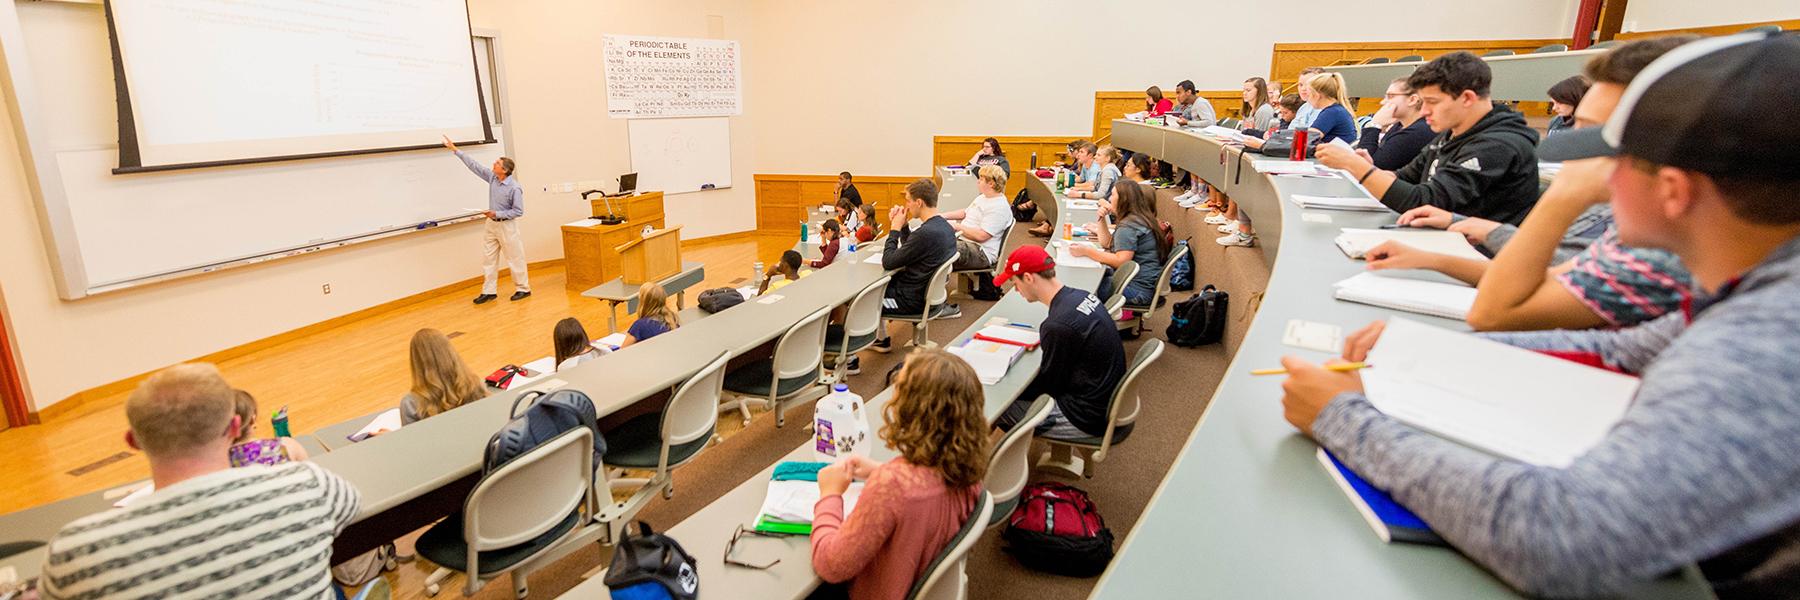 Professor Doyle Holbird teaching in large classroom of meyer hall.